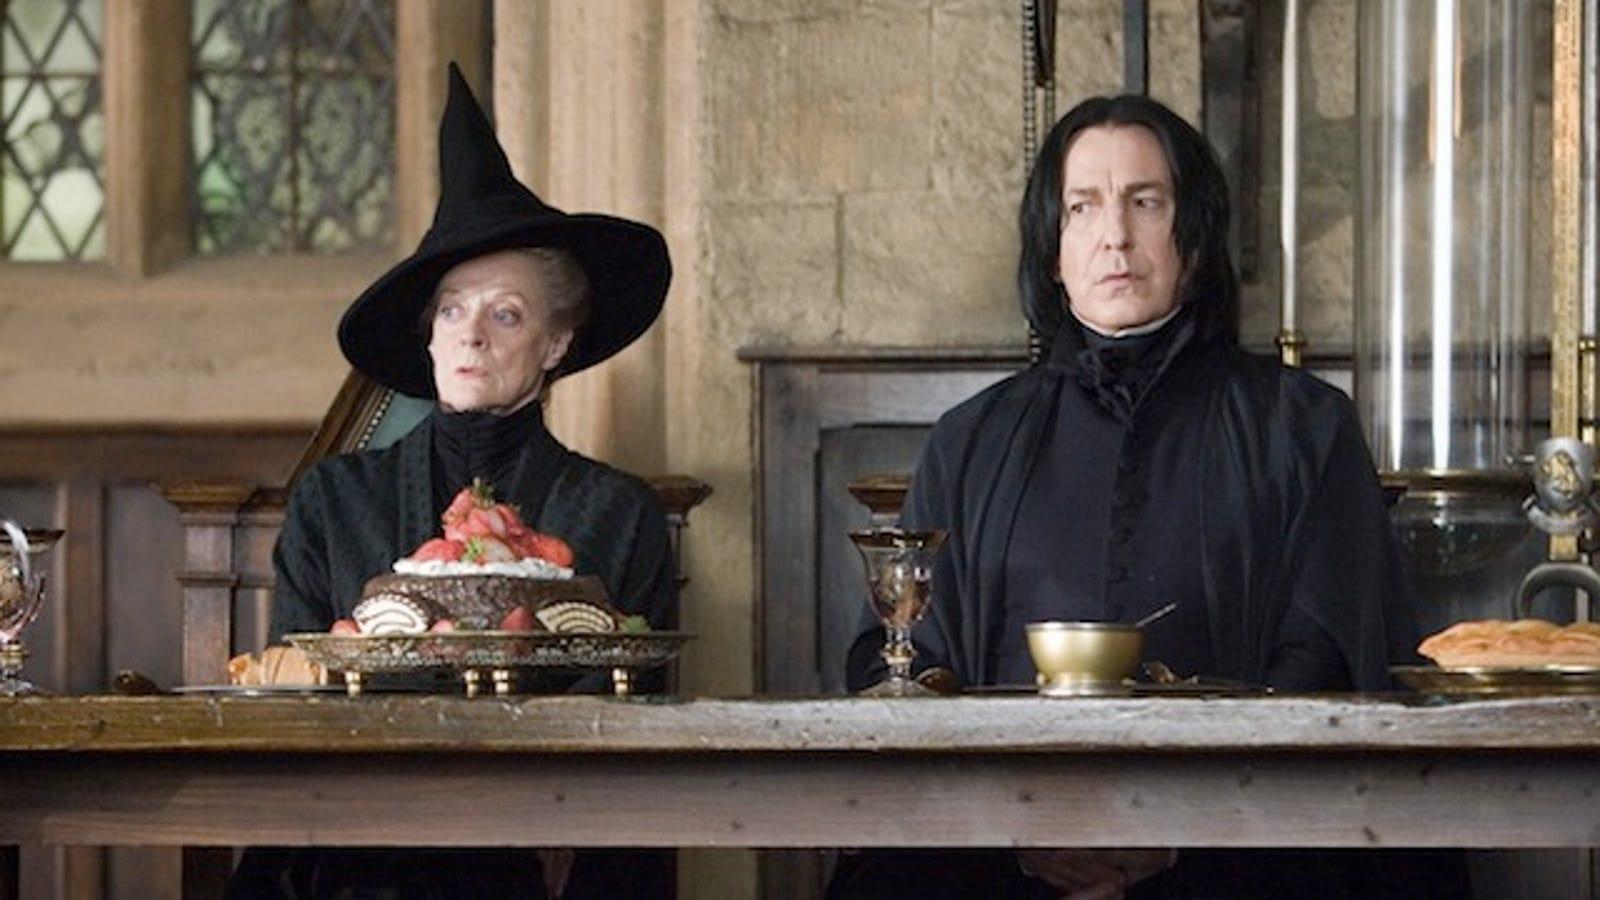 What If Hogwarts Had A Mandatory Sex Ed Class?